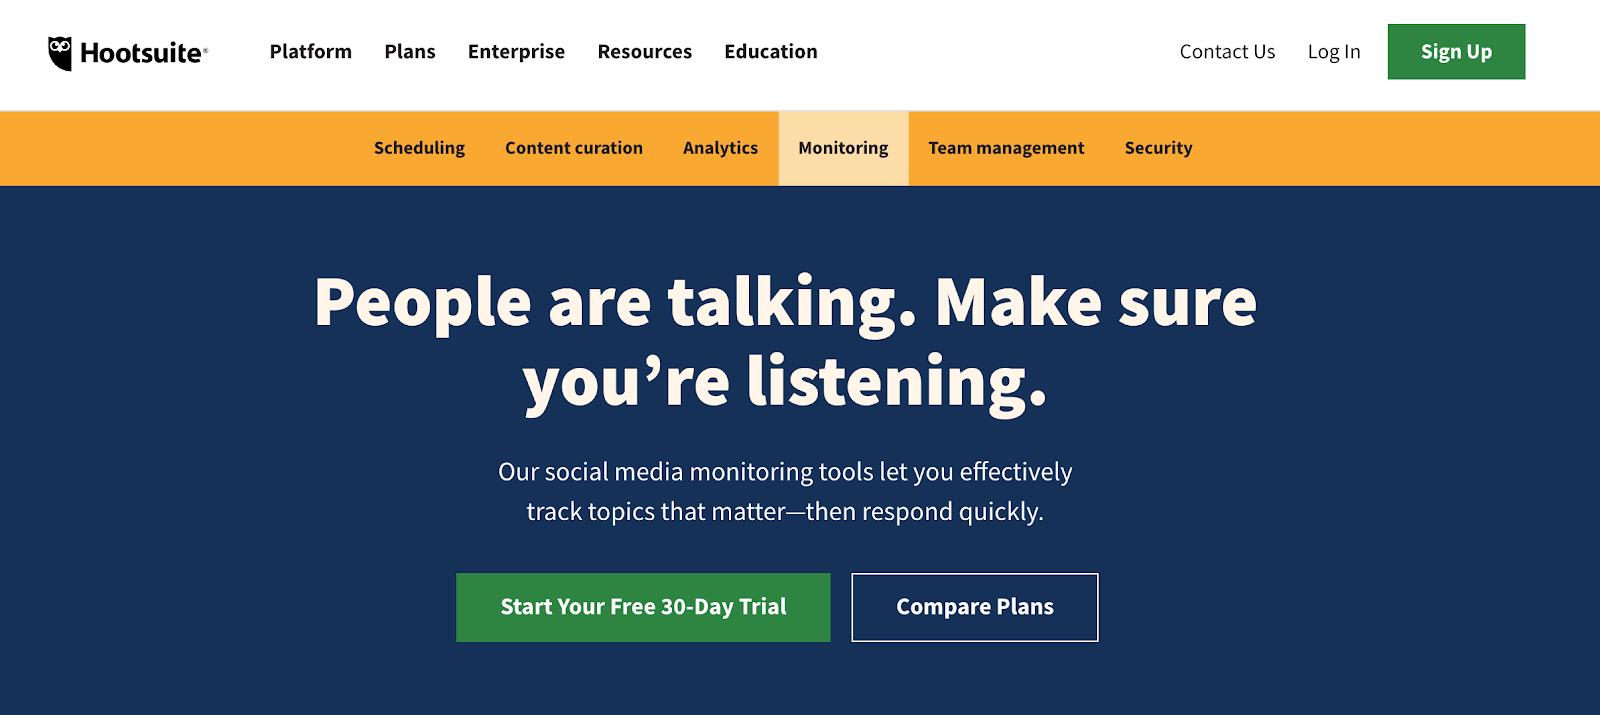 screenshot hootsuite landing page - social media monitoring tool